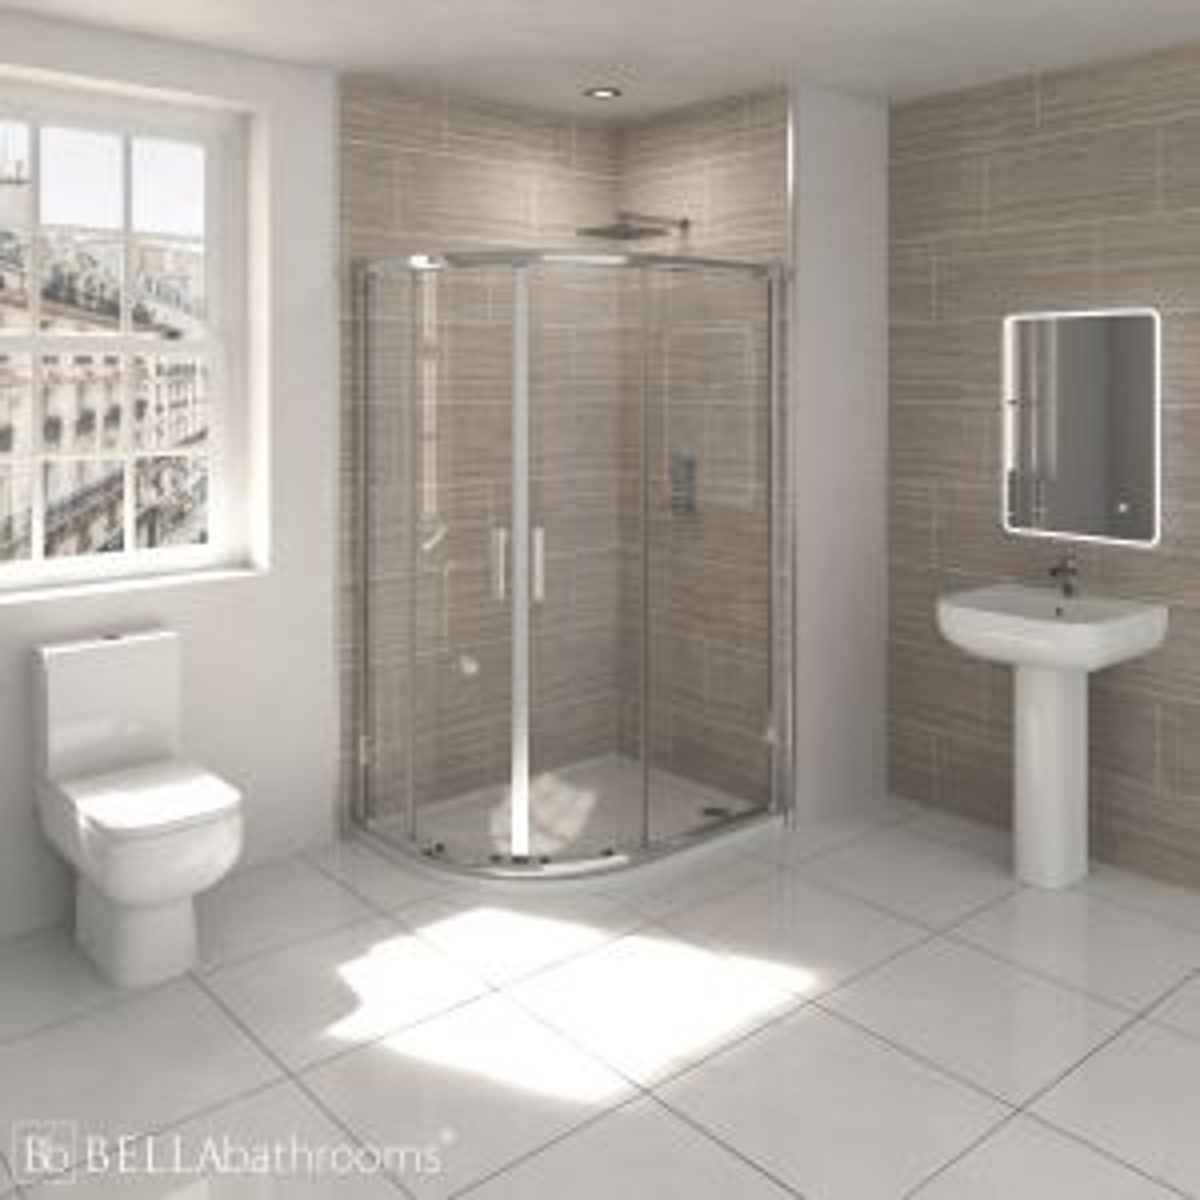 RAK Series 600 En-Suite Bathroom with Pacific Offset Quadrant Shower Enclosure